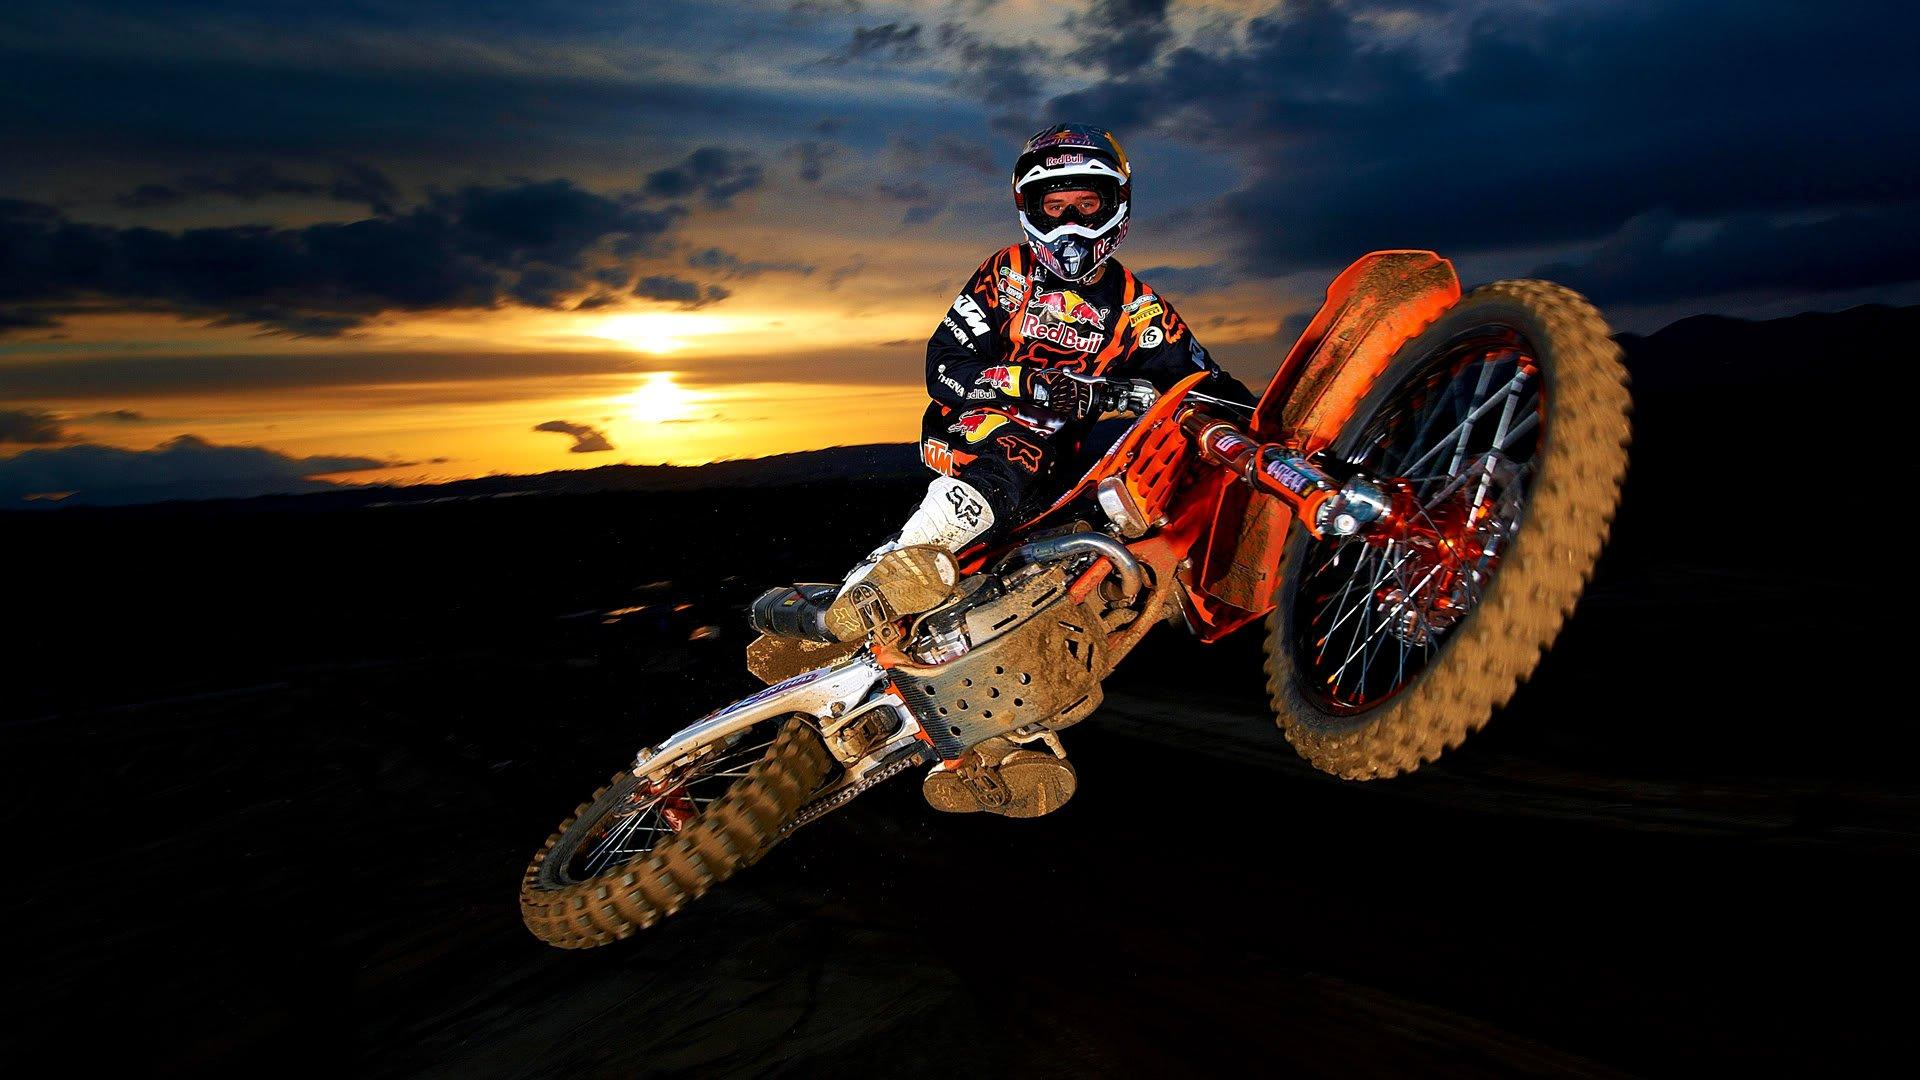 Best Action KTM Motocross Wallpaper Background 7959 Wallpaper High 1920x1080